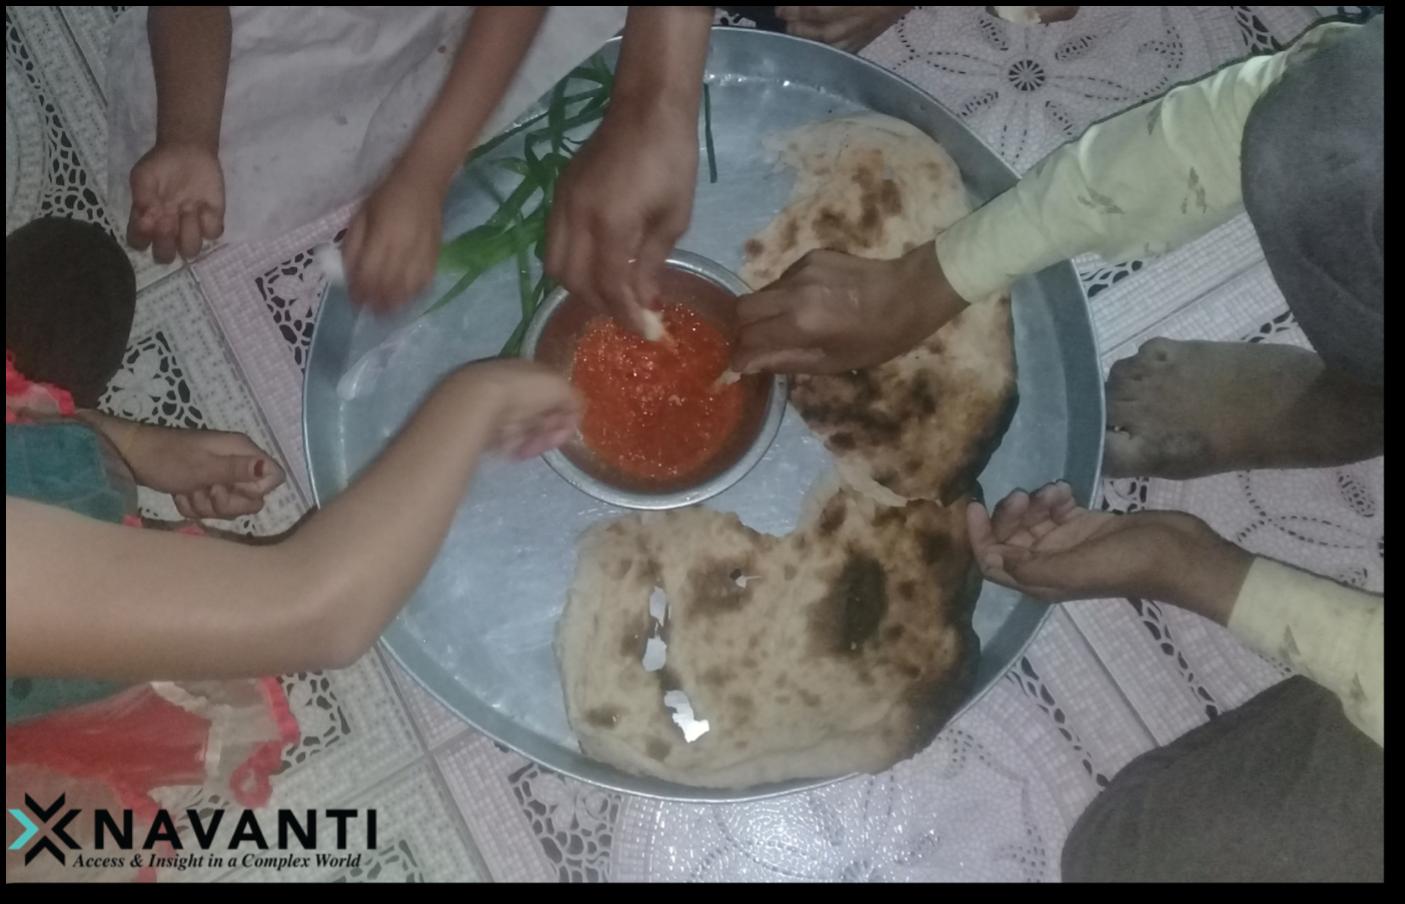 A family in Ta'izz shares a meal, Source: Navanti